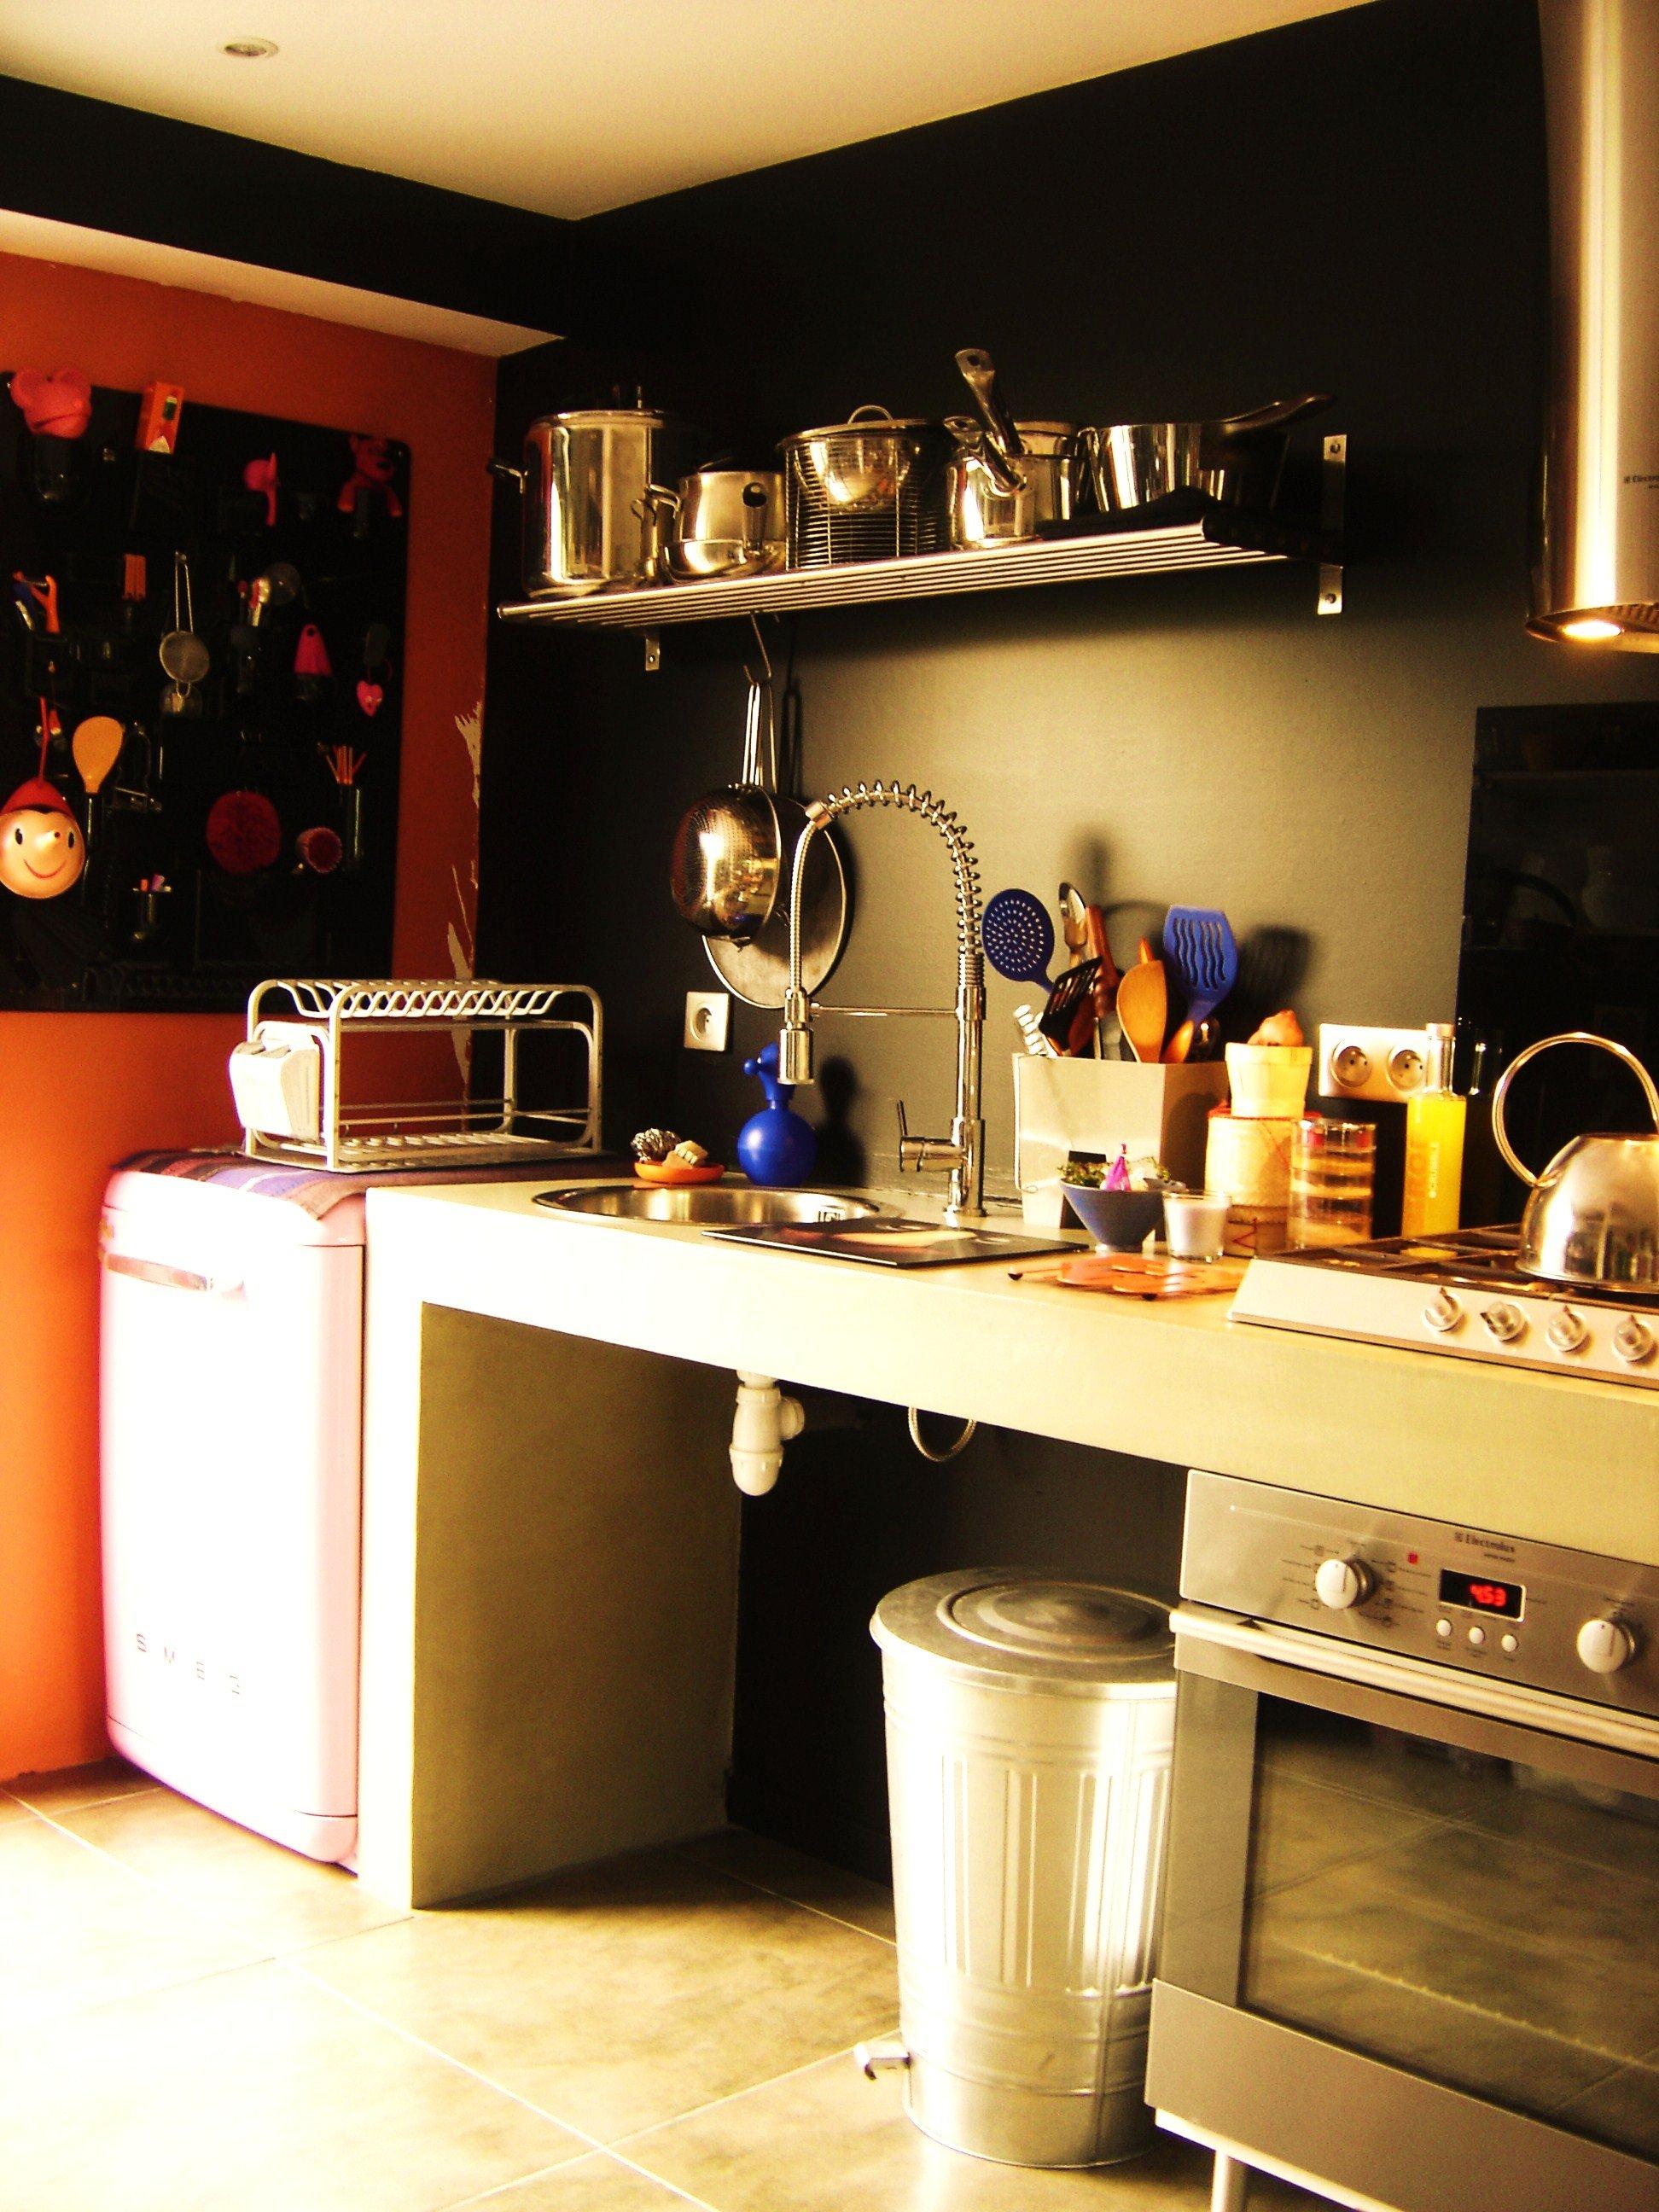 cuisinect1.jpg